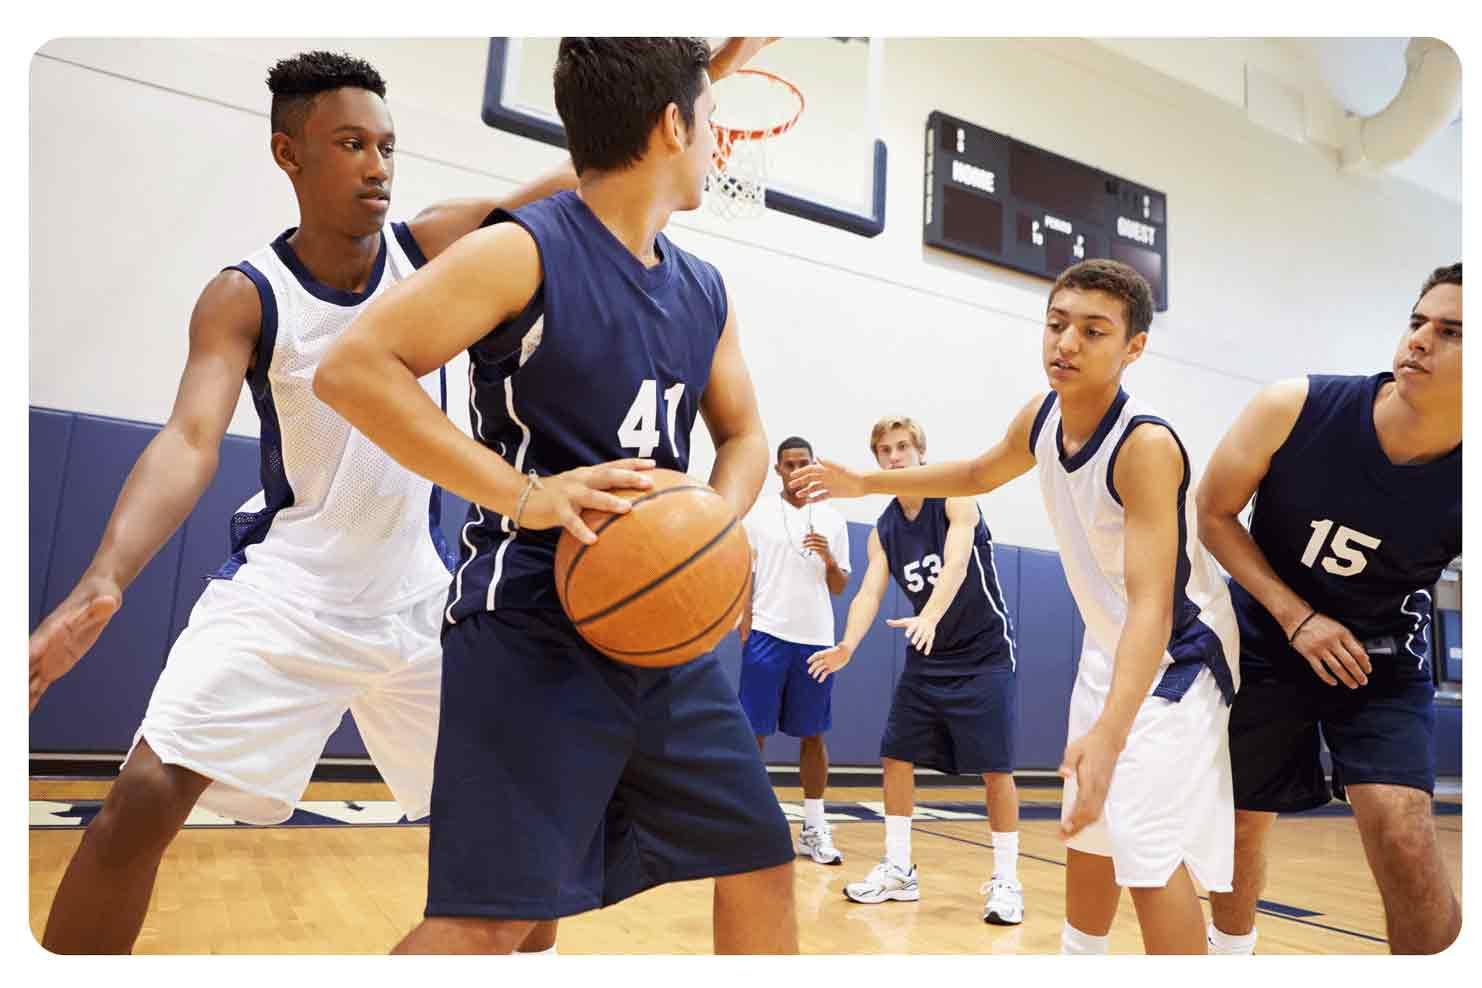 Youth Basketball Dayton